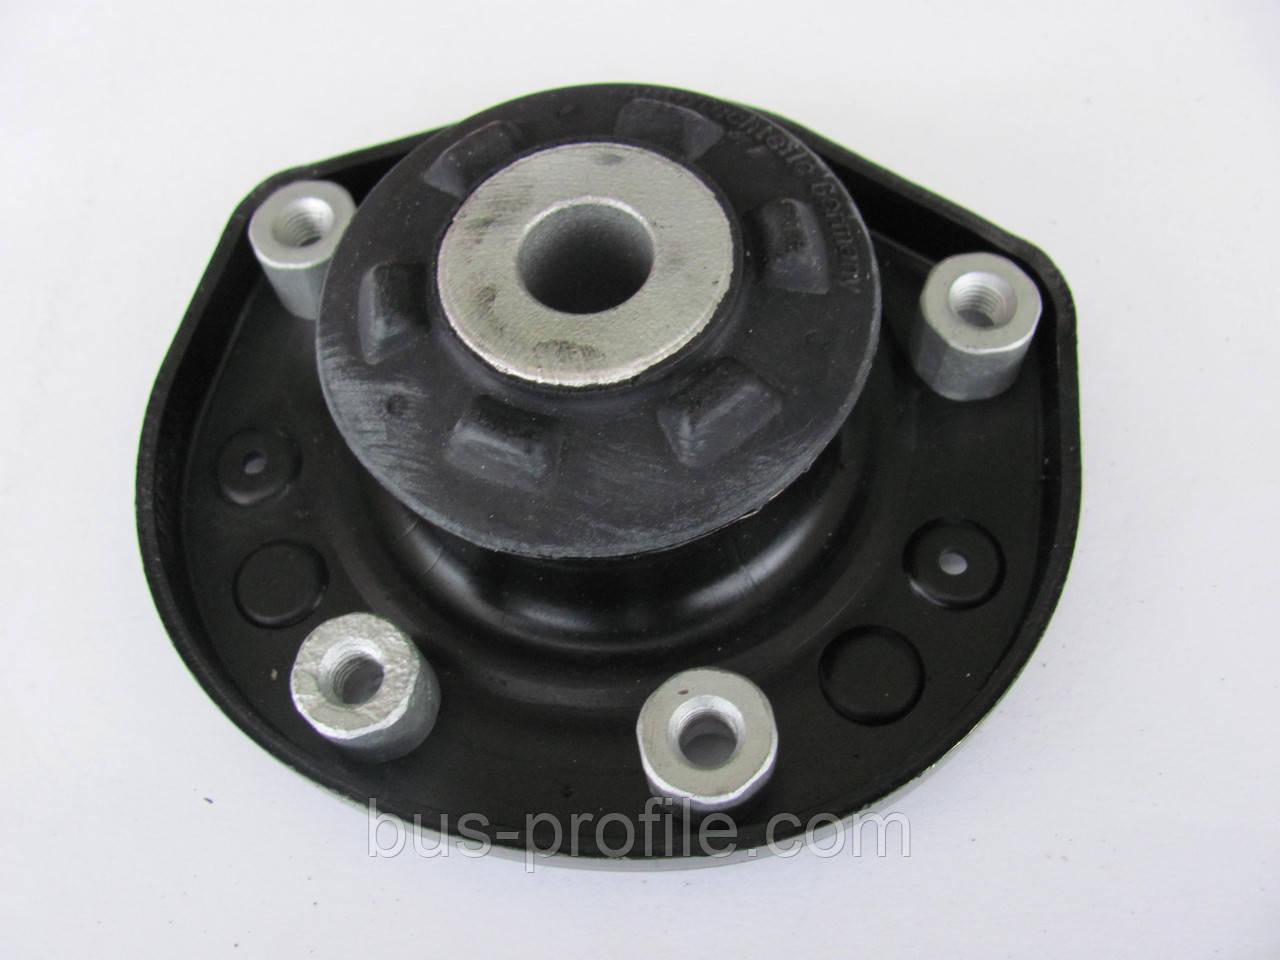 Подушка переднего амортизатора – ROTWEISS (ТУРЦИЯ) - на MB SPRINTER , VW CRAFTER  2006→ – 9063230520